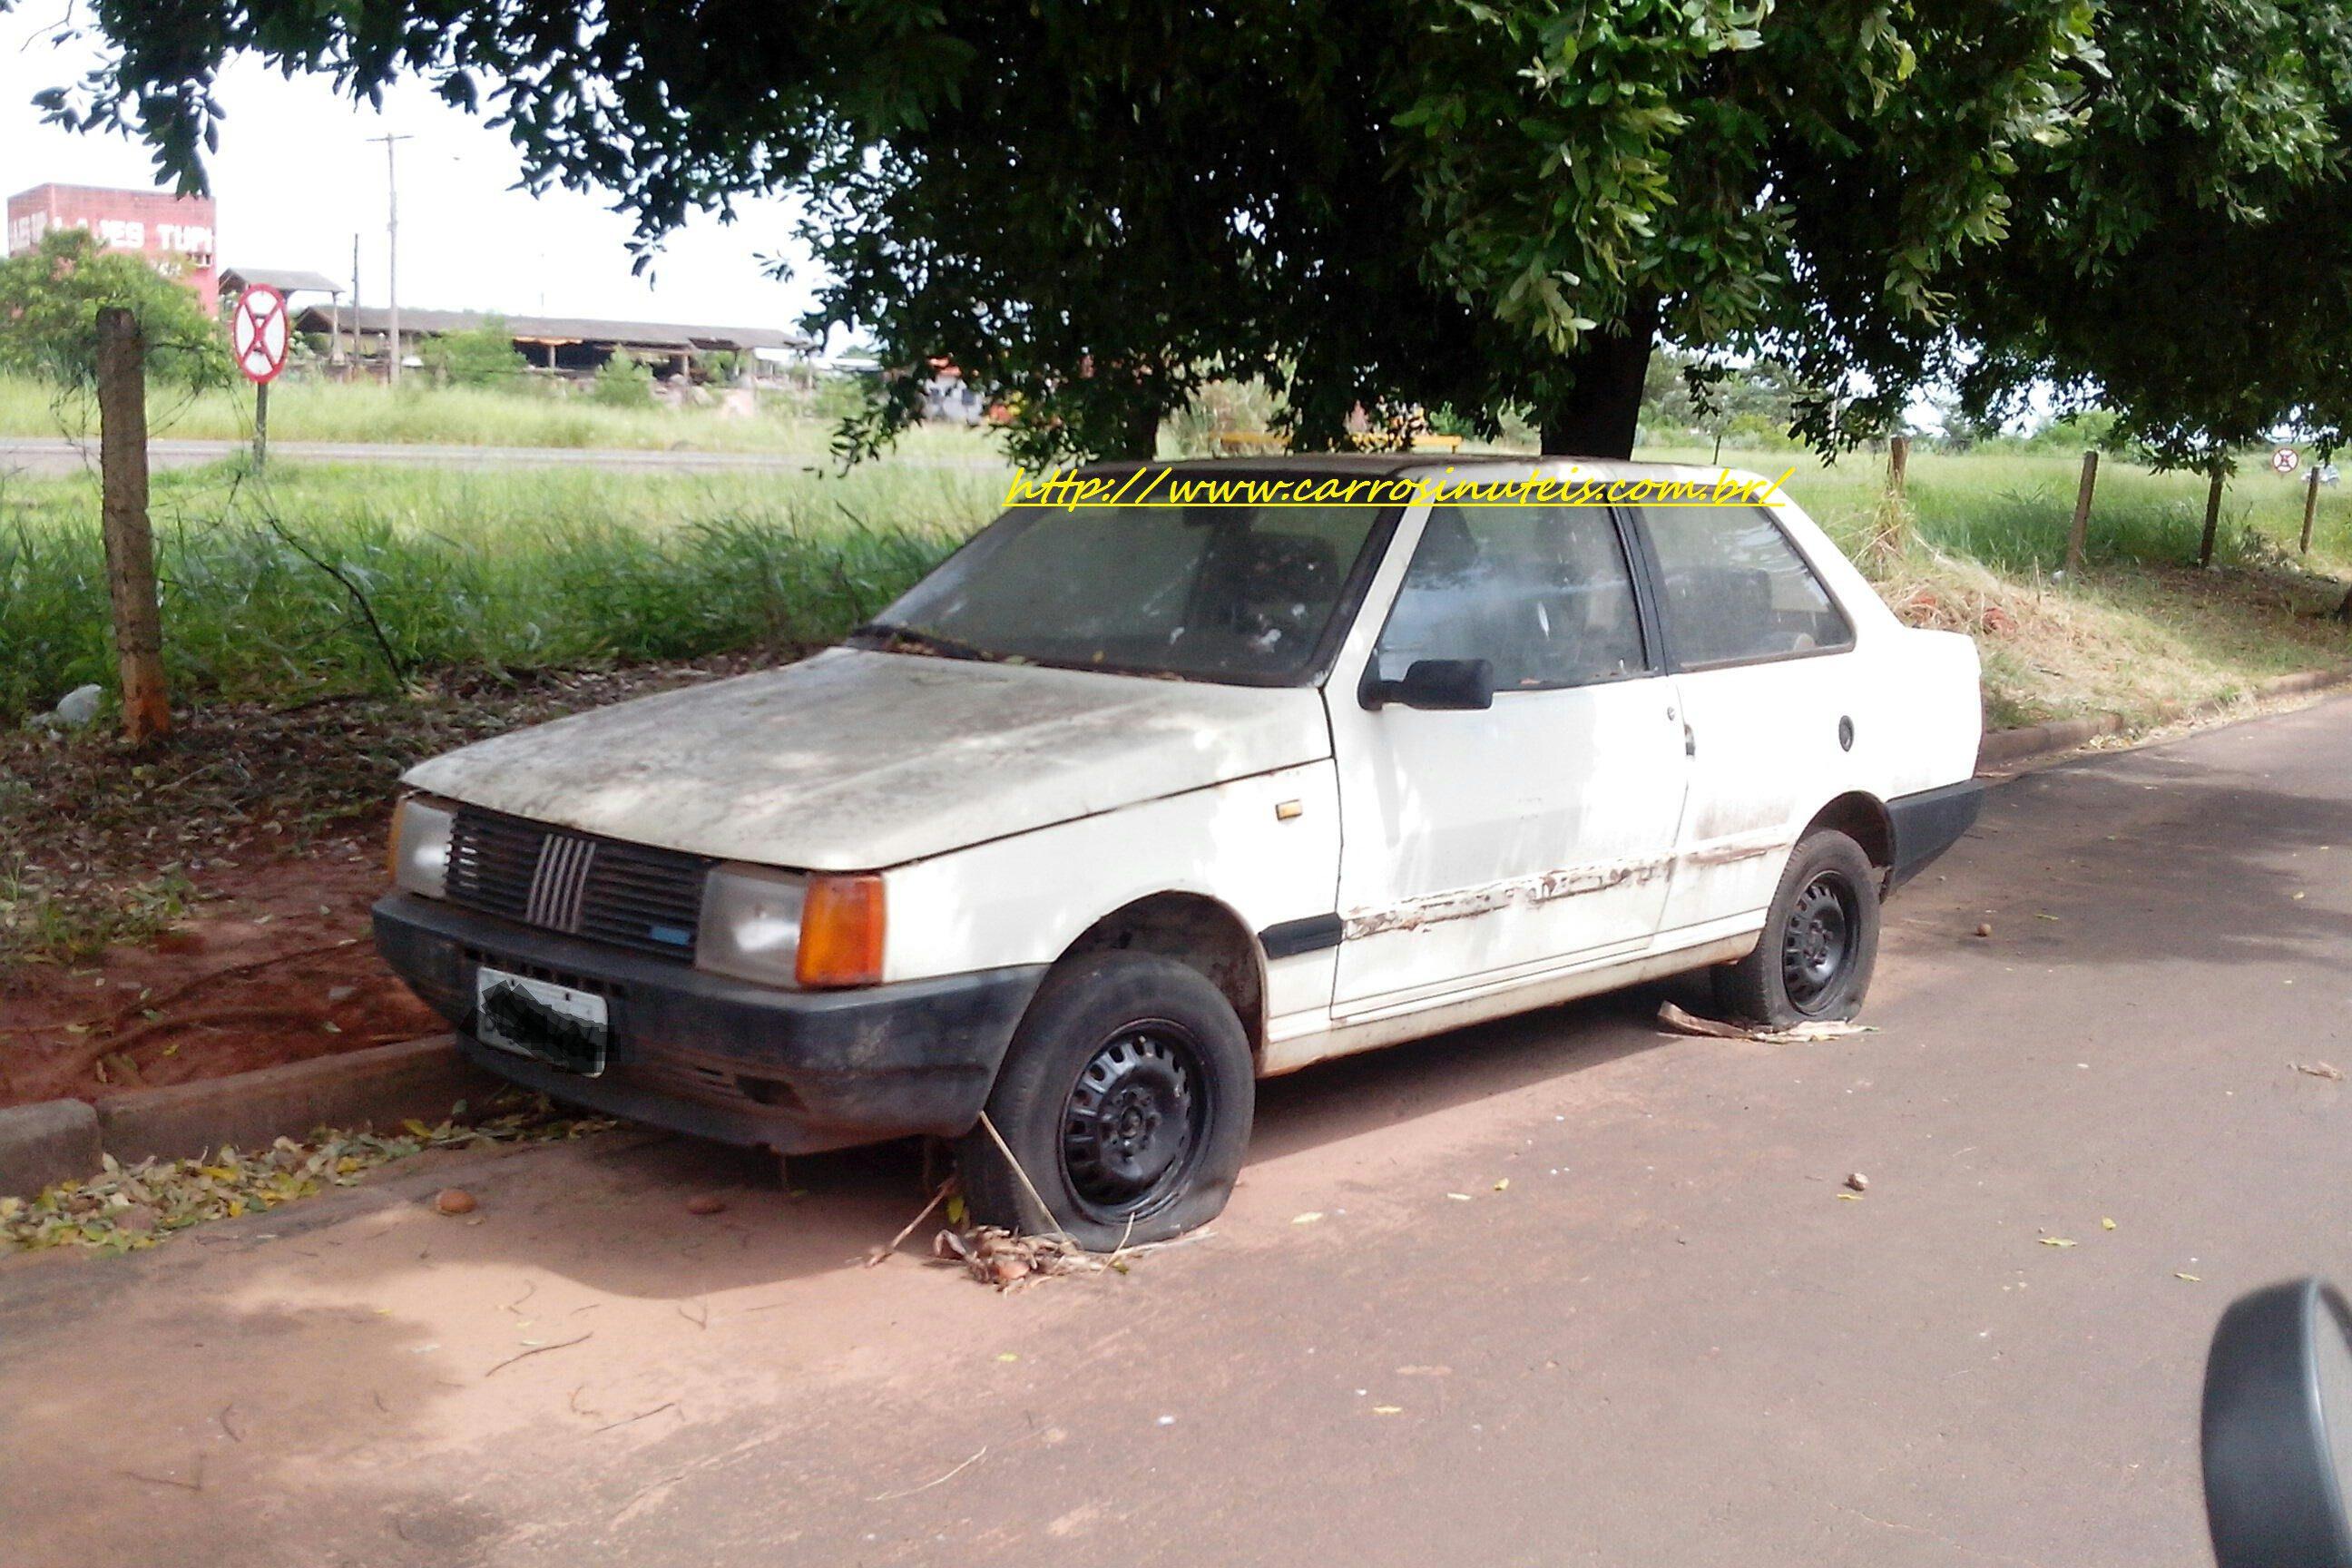 Fiat-Premio-Tupi-paulista-SP-Antônio-lima Fiat Prêmio, Tupi Paulista-SP, Antônio